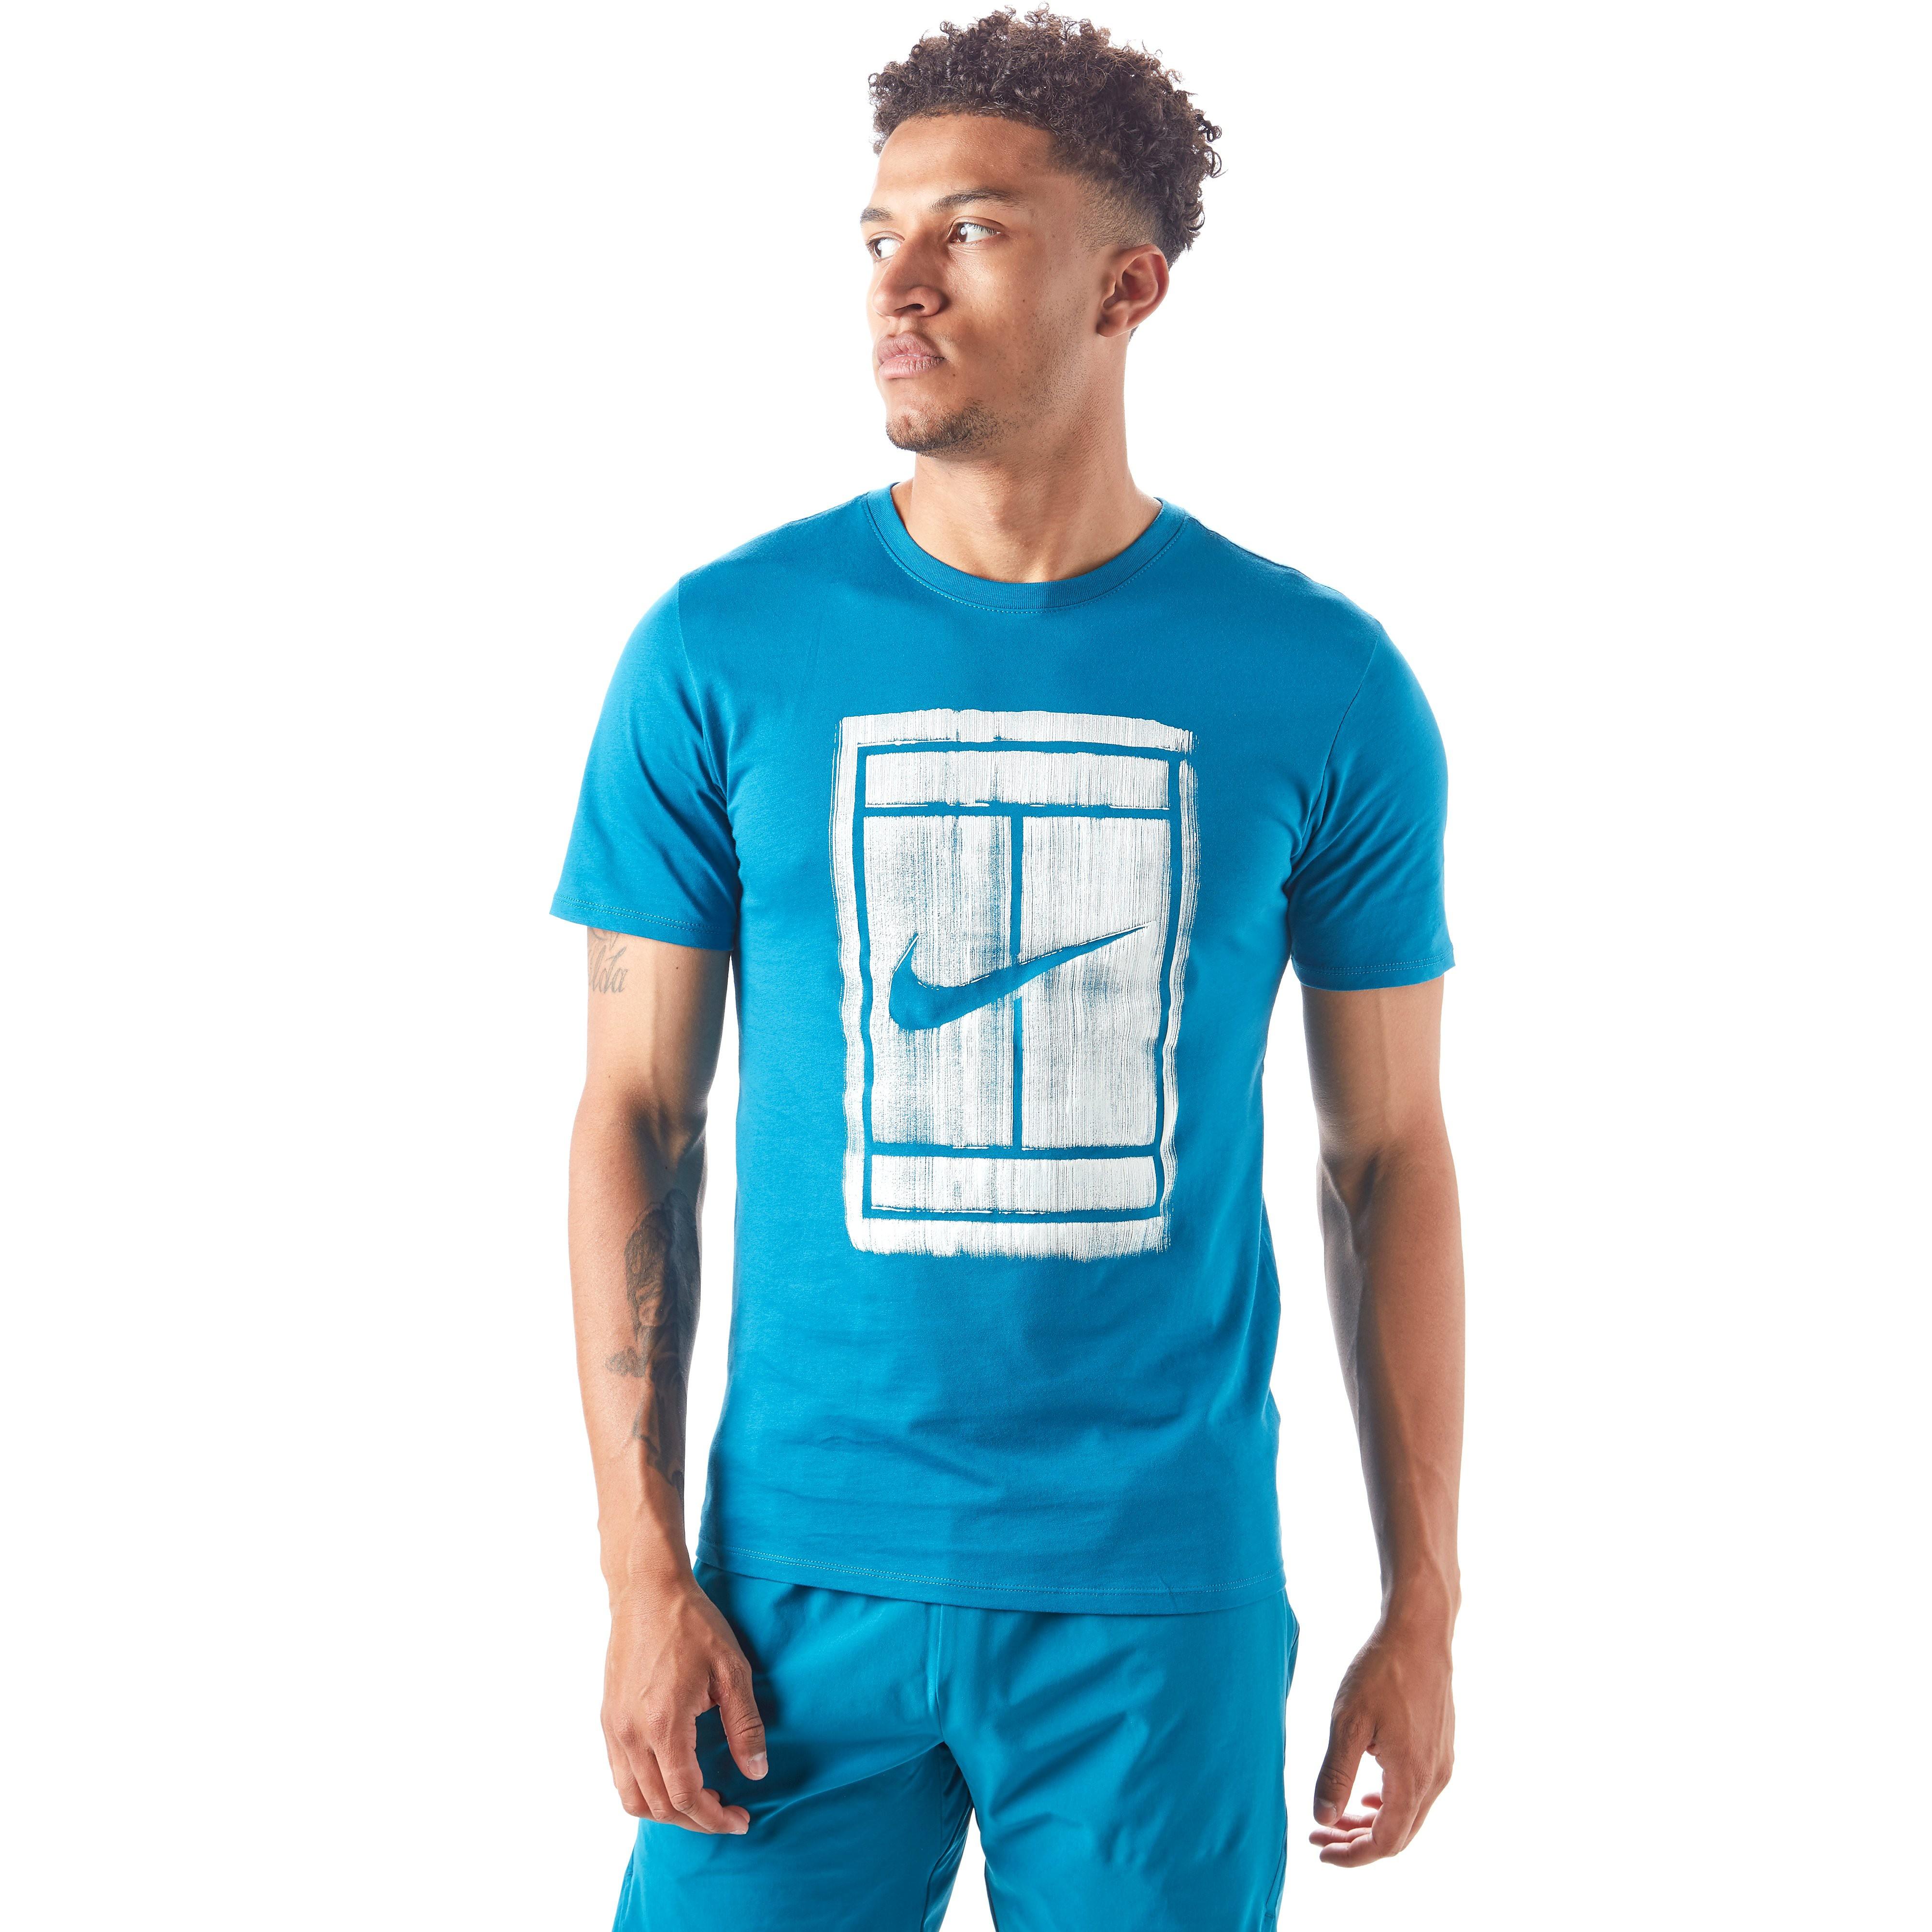 Nike Court Men's Tennis T-Shirt